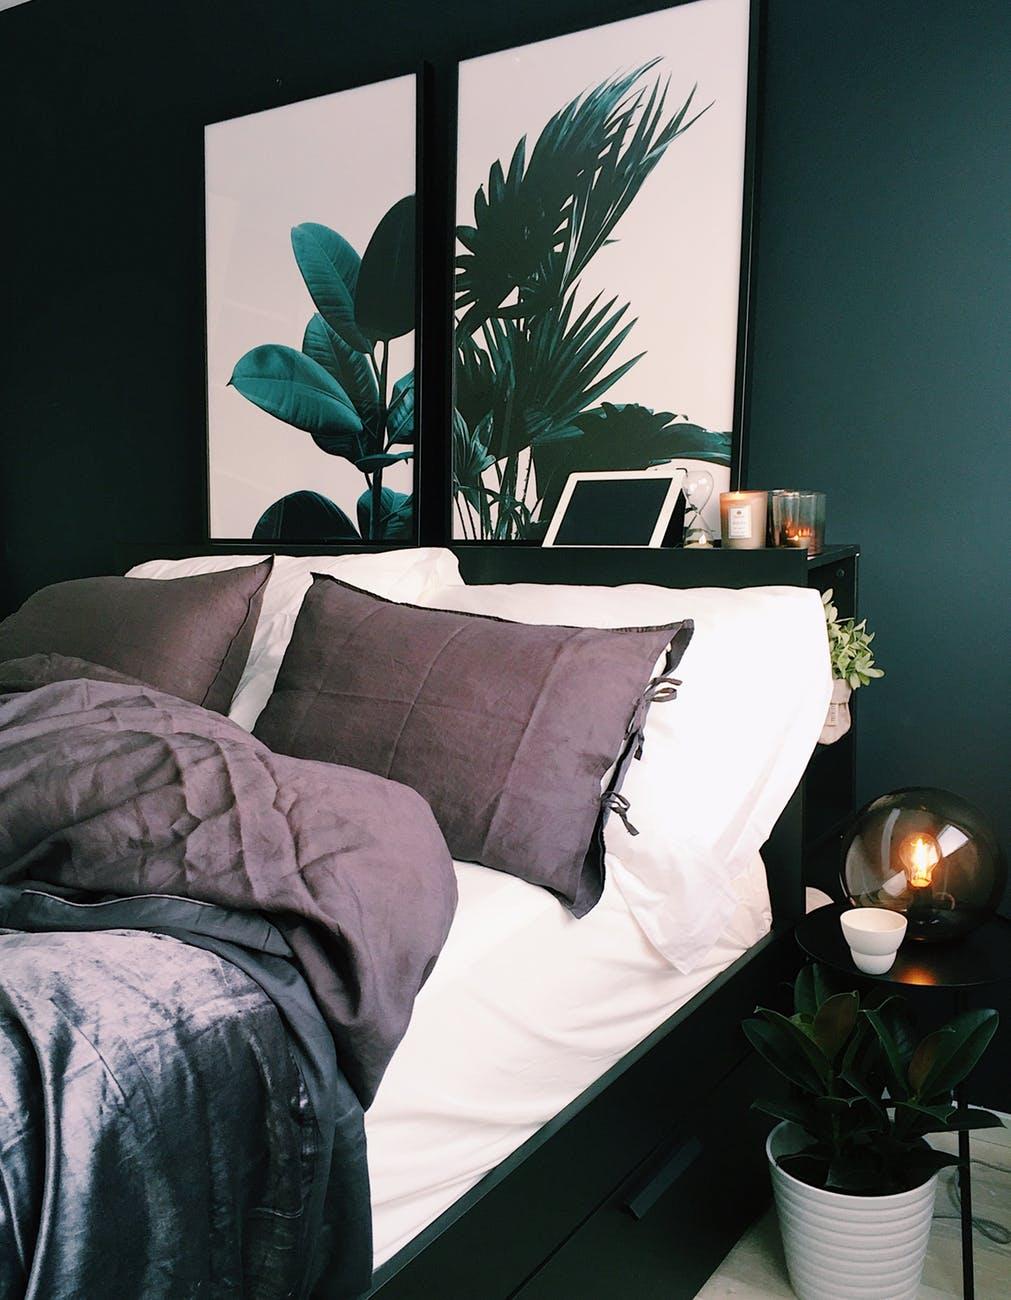 Best High Quality Bedding